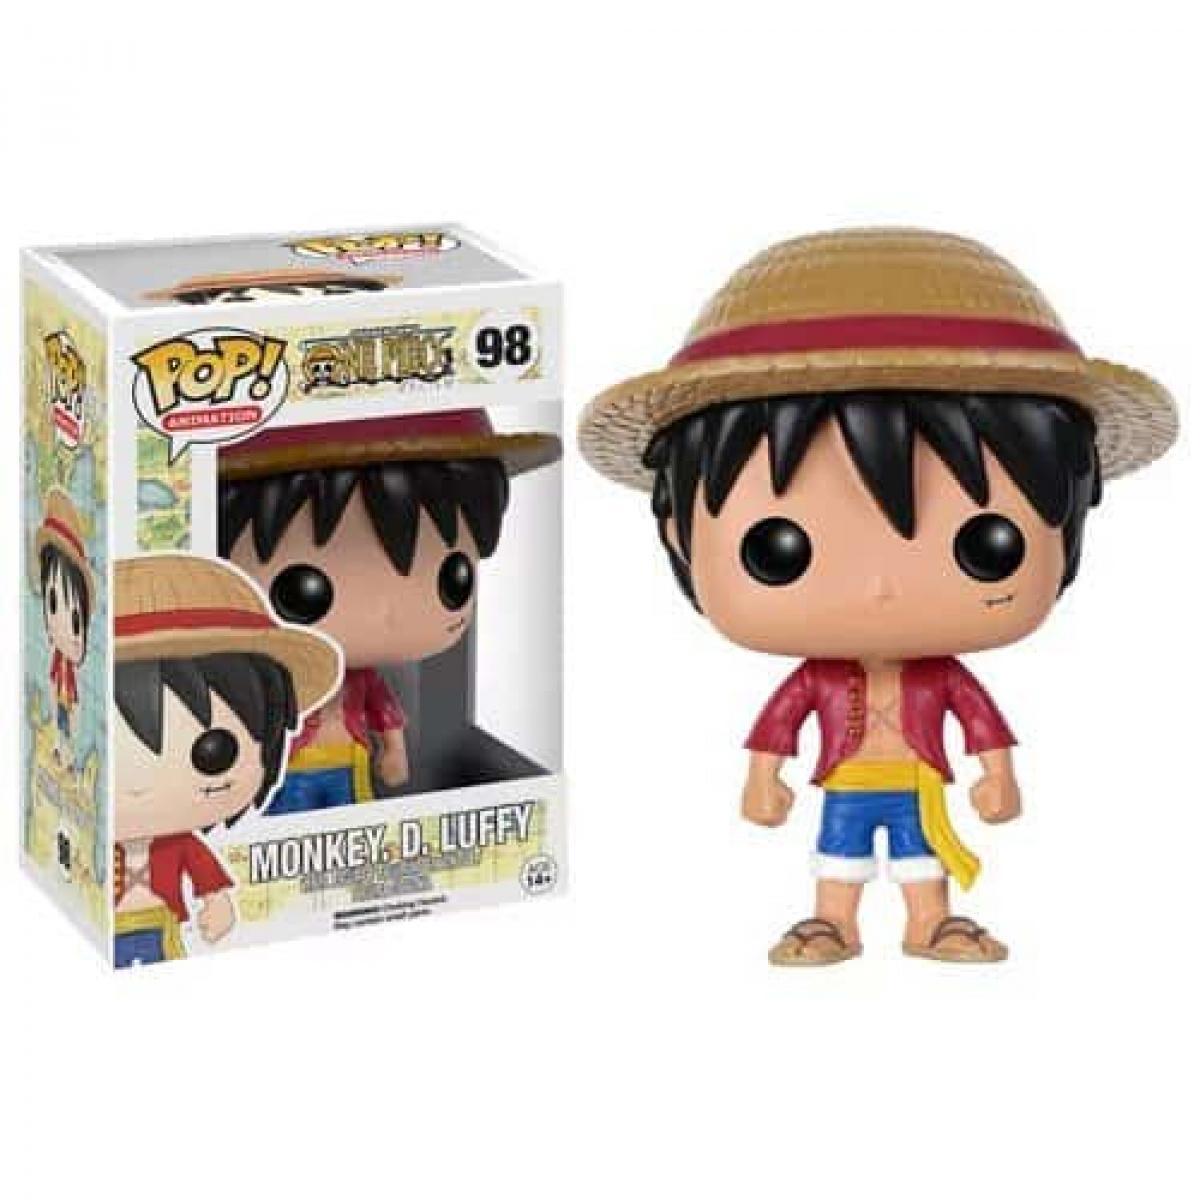 One Piece Monkey D. Luffy Pop! Vinyl Figure Figures 4